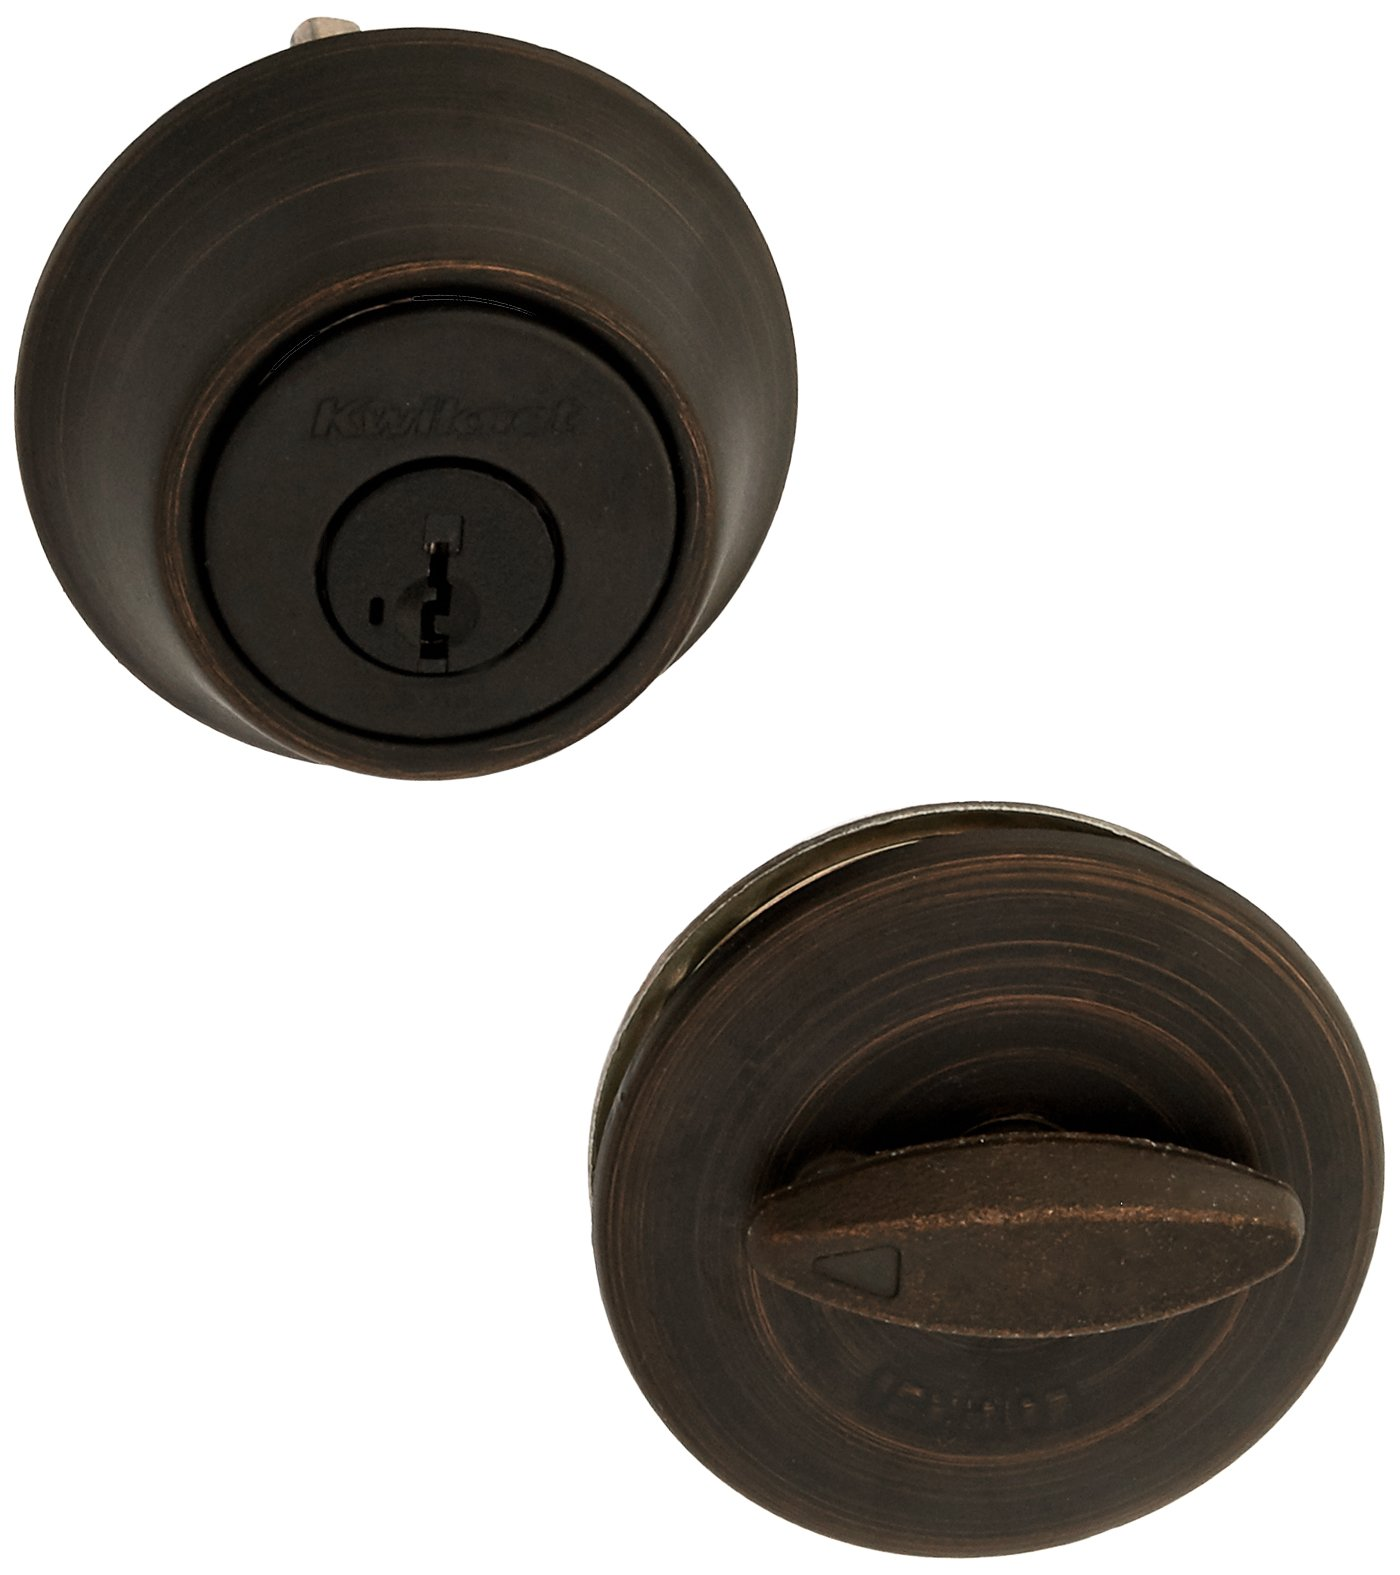 Kwikset 660 11P 660 Series 660 Single Cylinder Deadbolt, Venetian Bronze